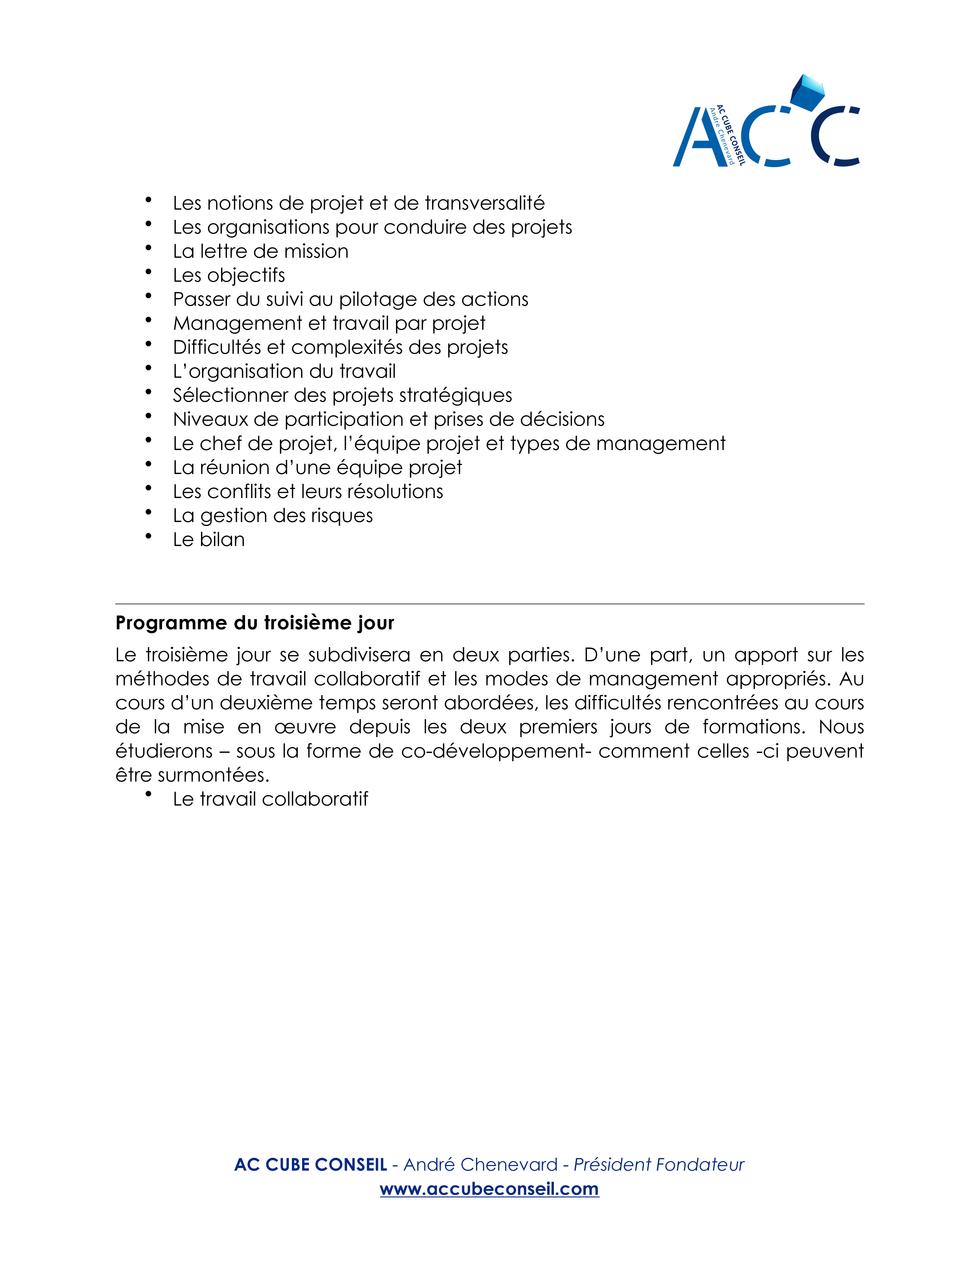 AC CUBE CONSEIL - MANAGEMENT TRANSVERSE_